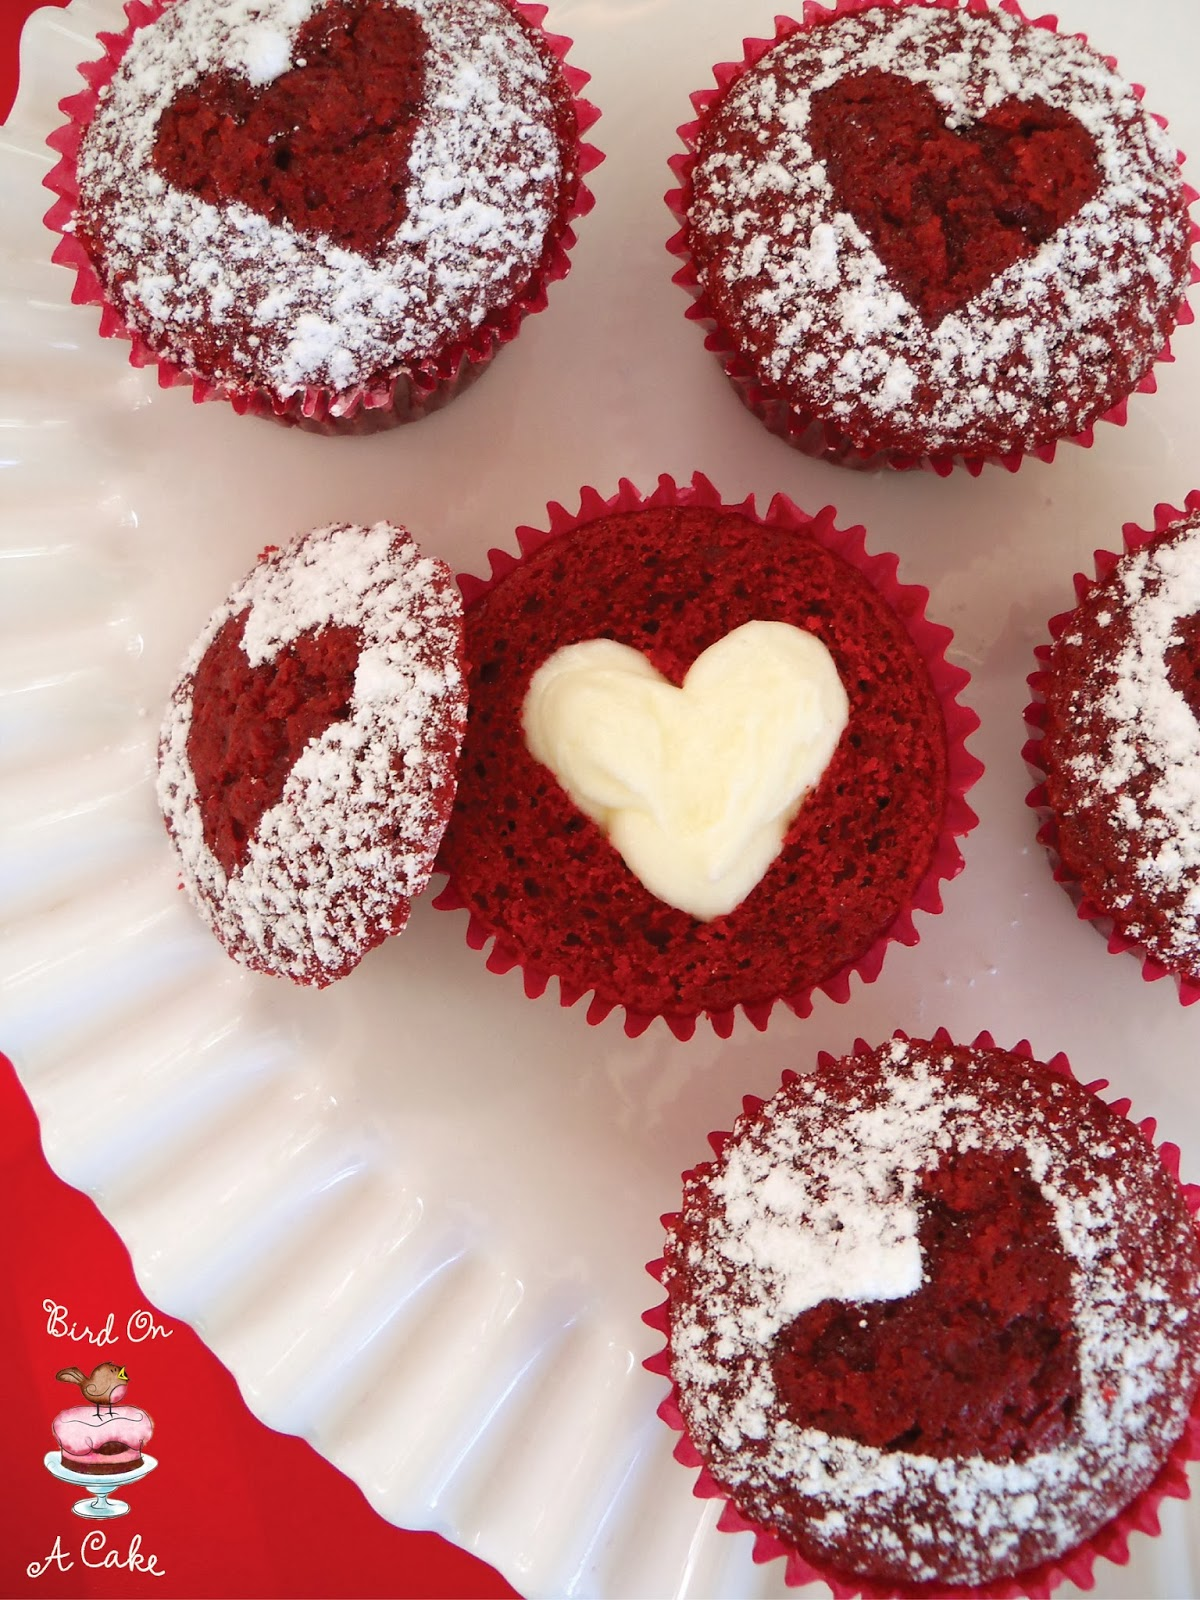 Bird On A Cake Hidden Heart Red Velvet Cupcakes